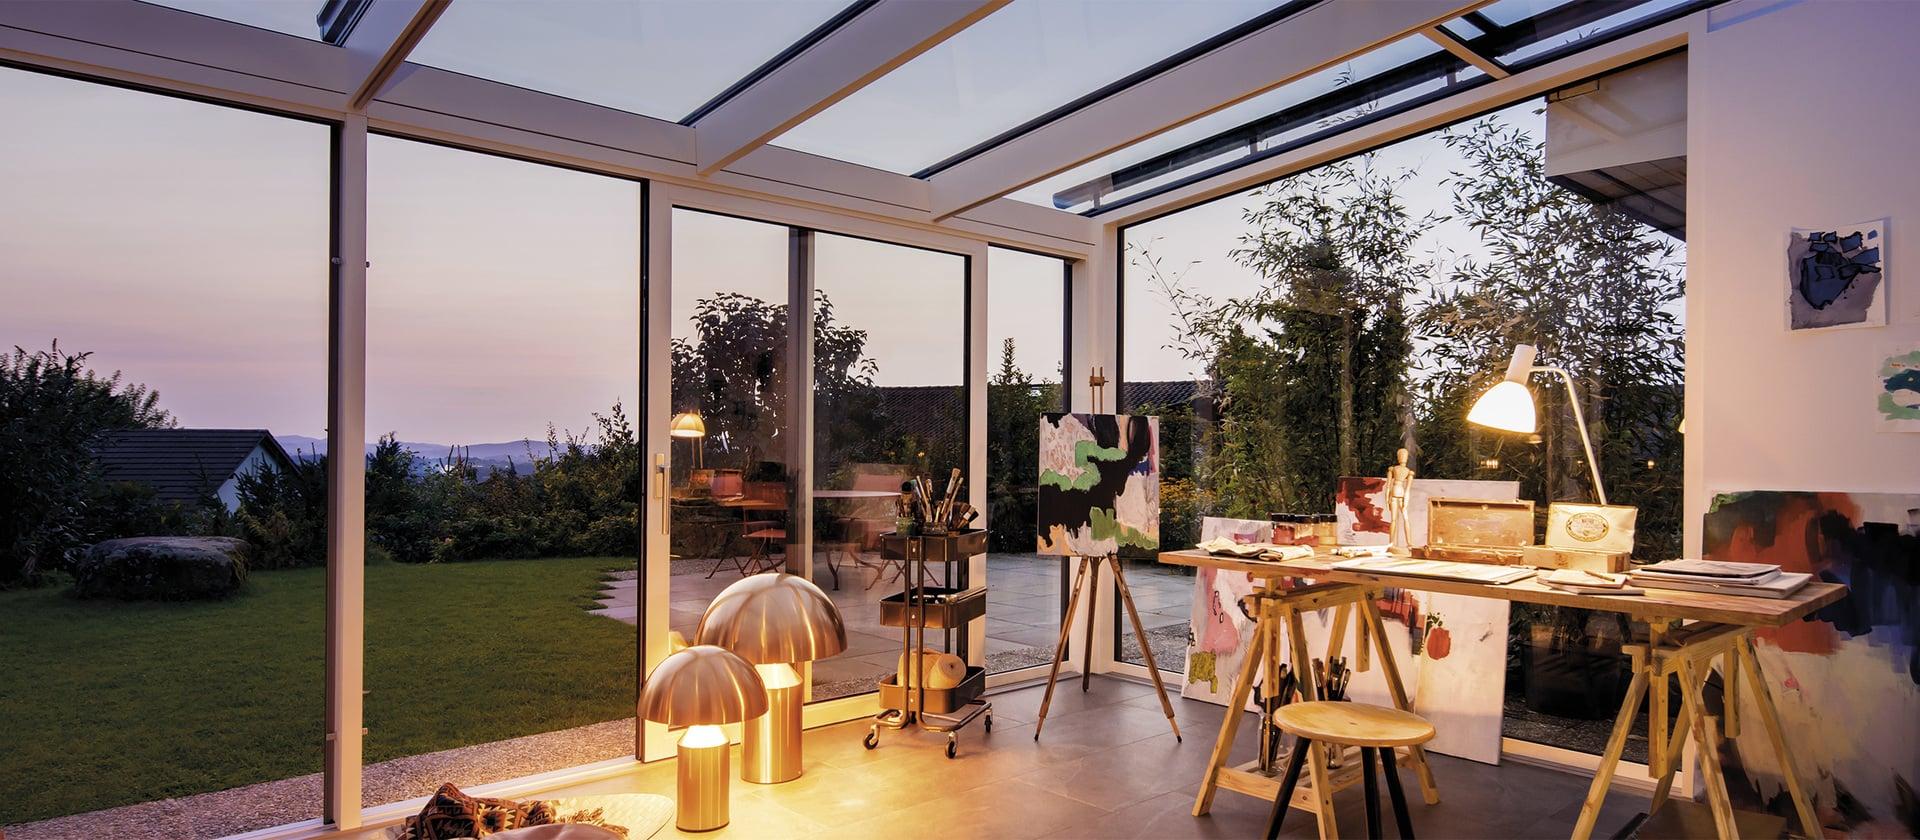 Mi veranda Finstral.